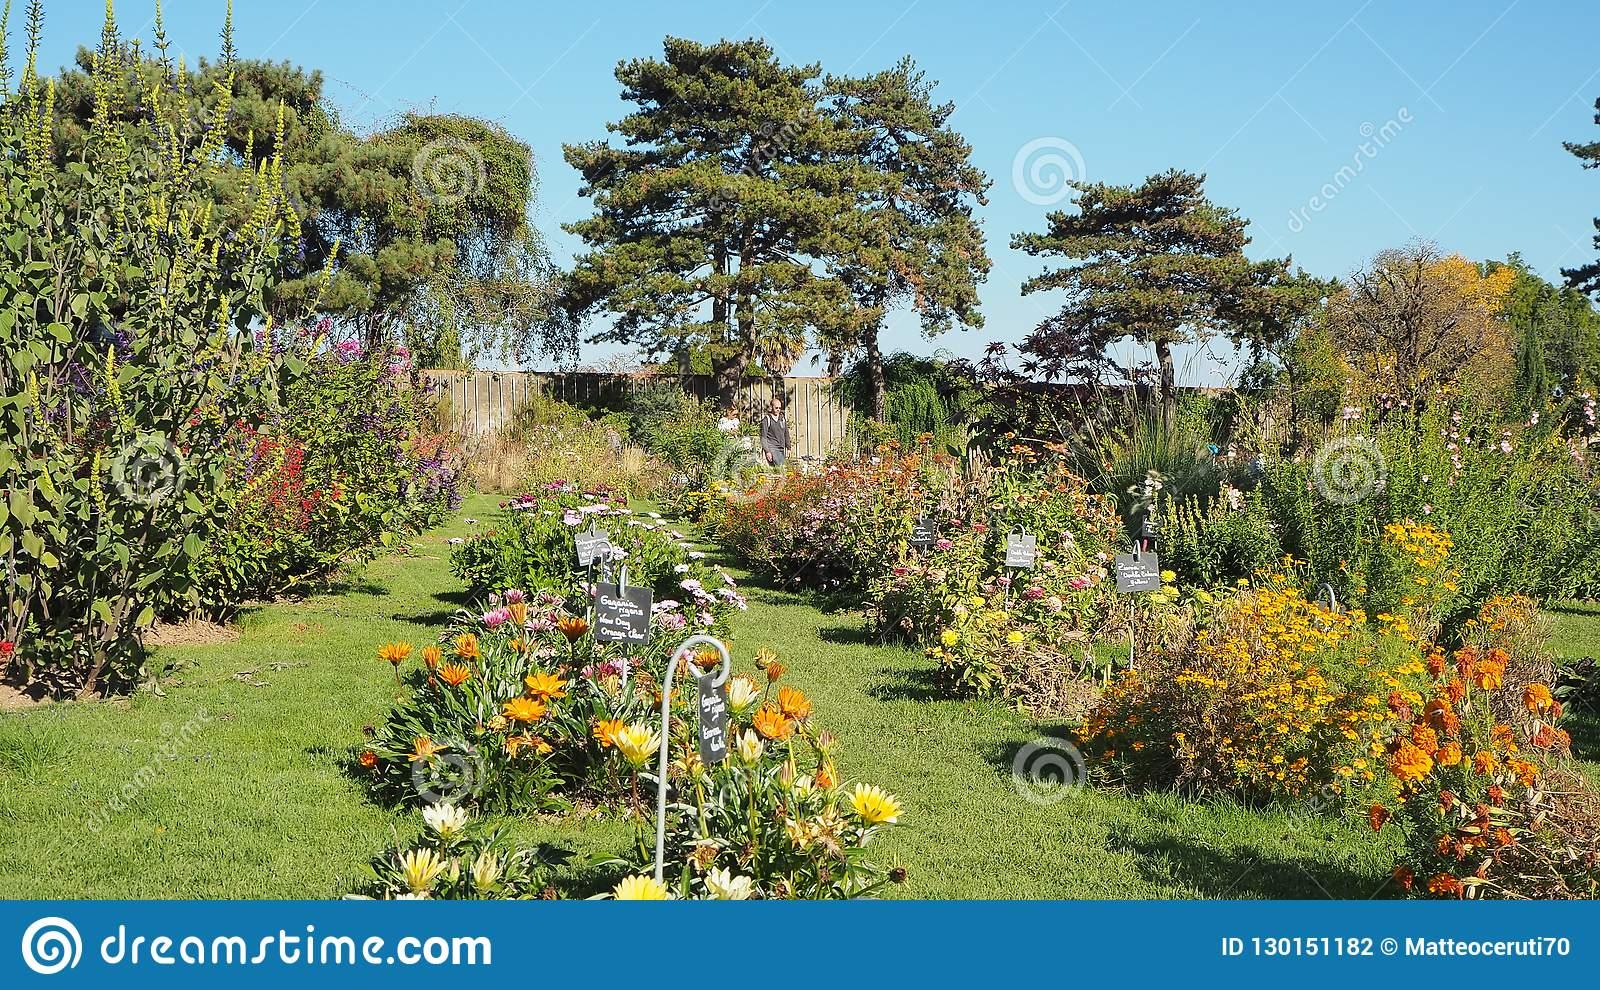 nantes france jardin des plantes de nantes municipal botanical garden city center nantes france jardin des